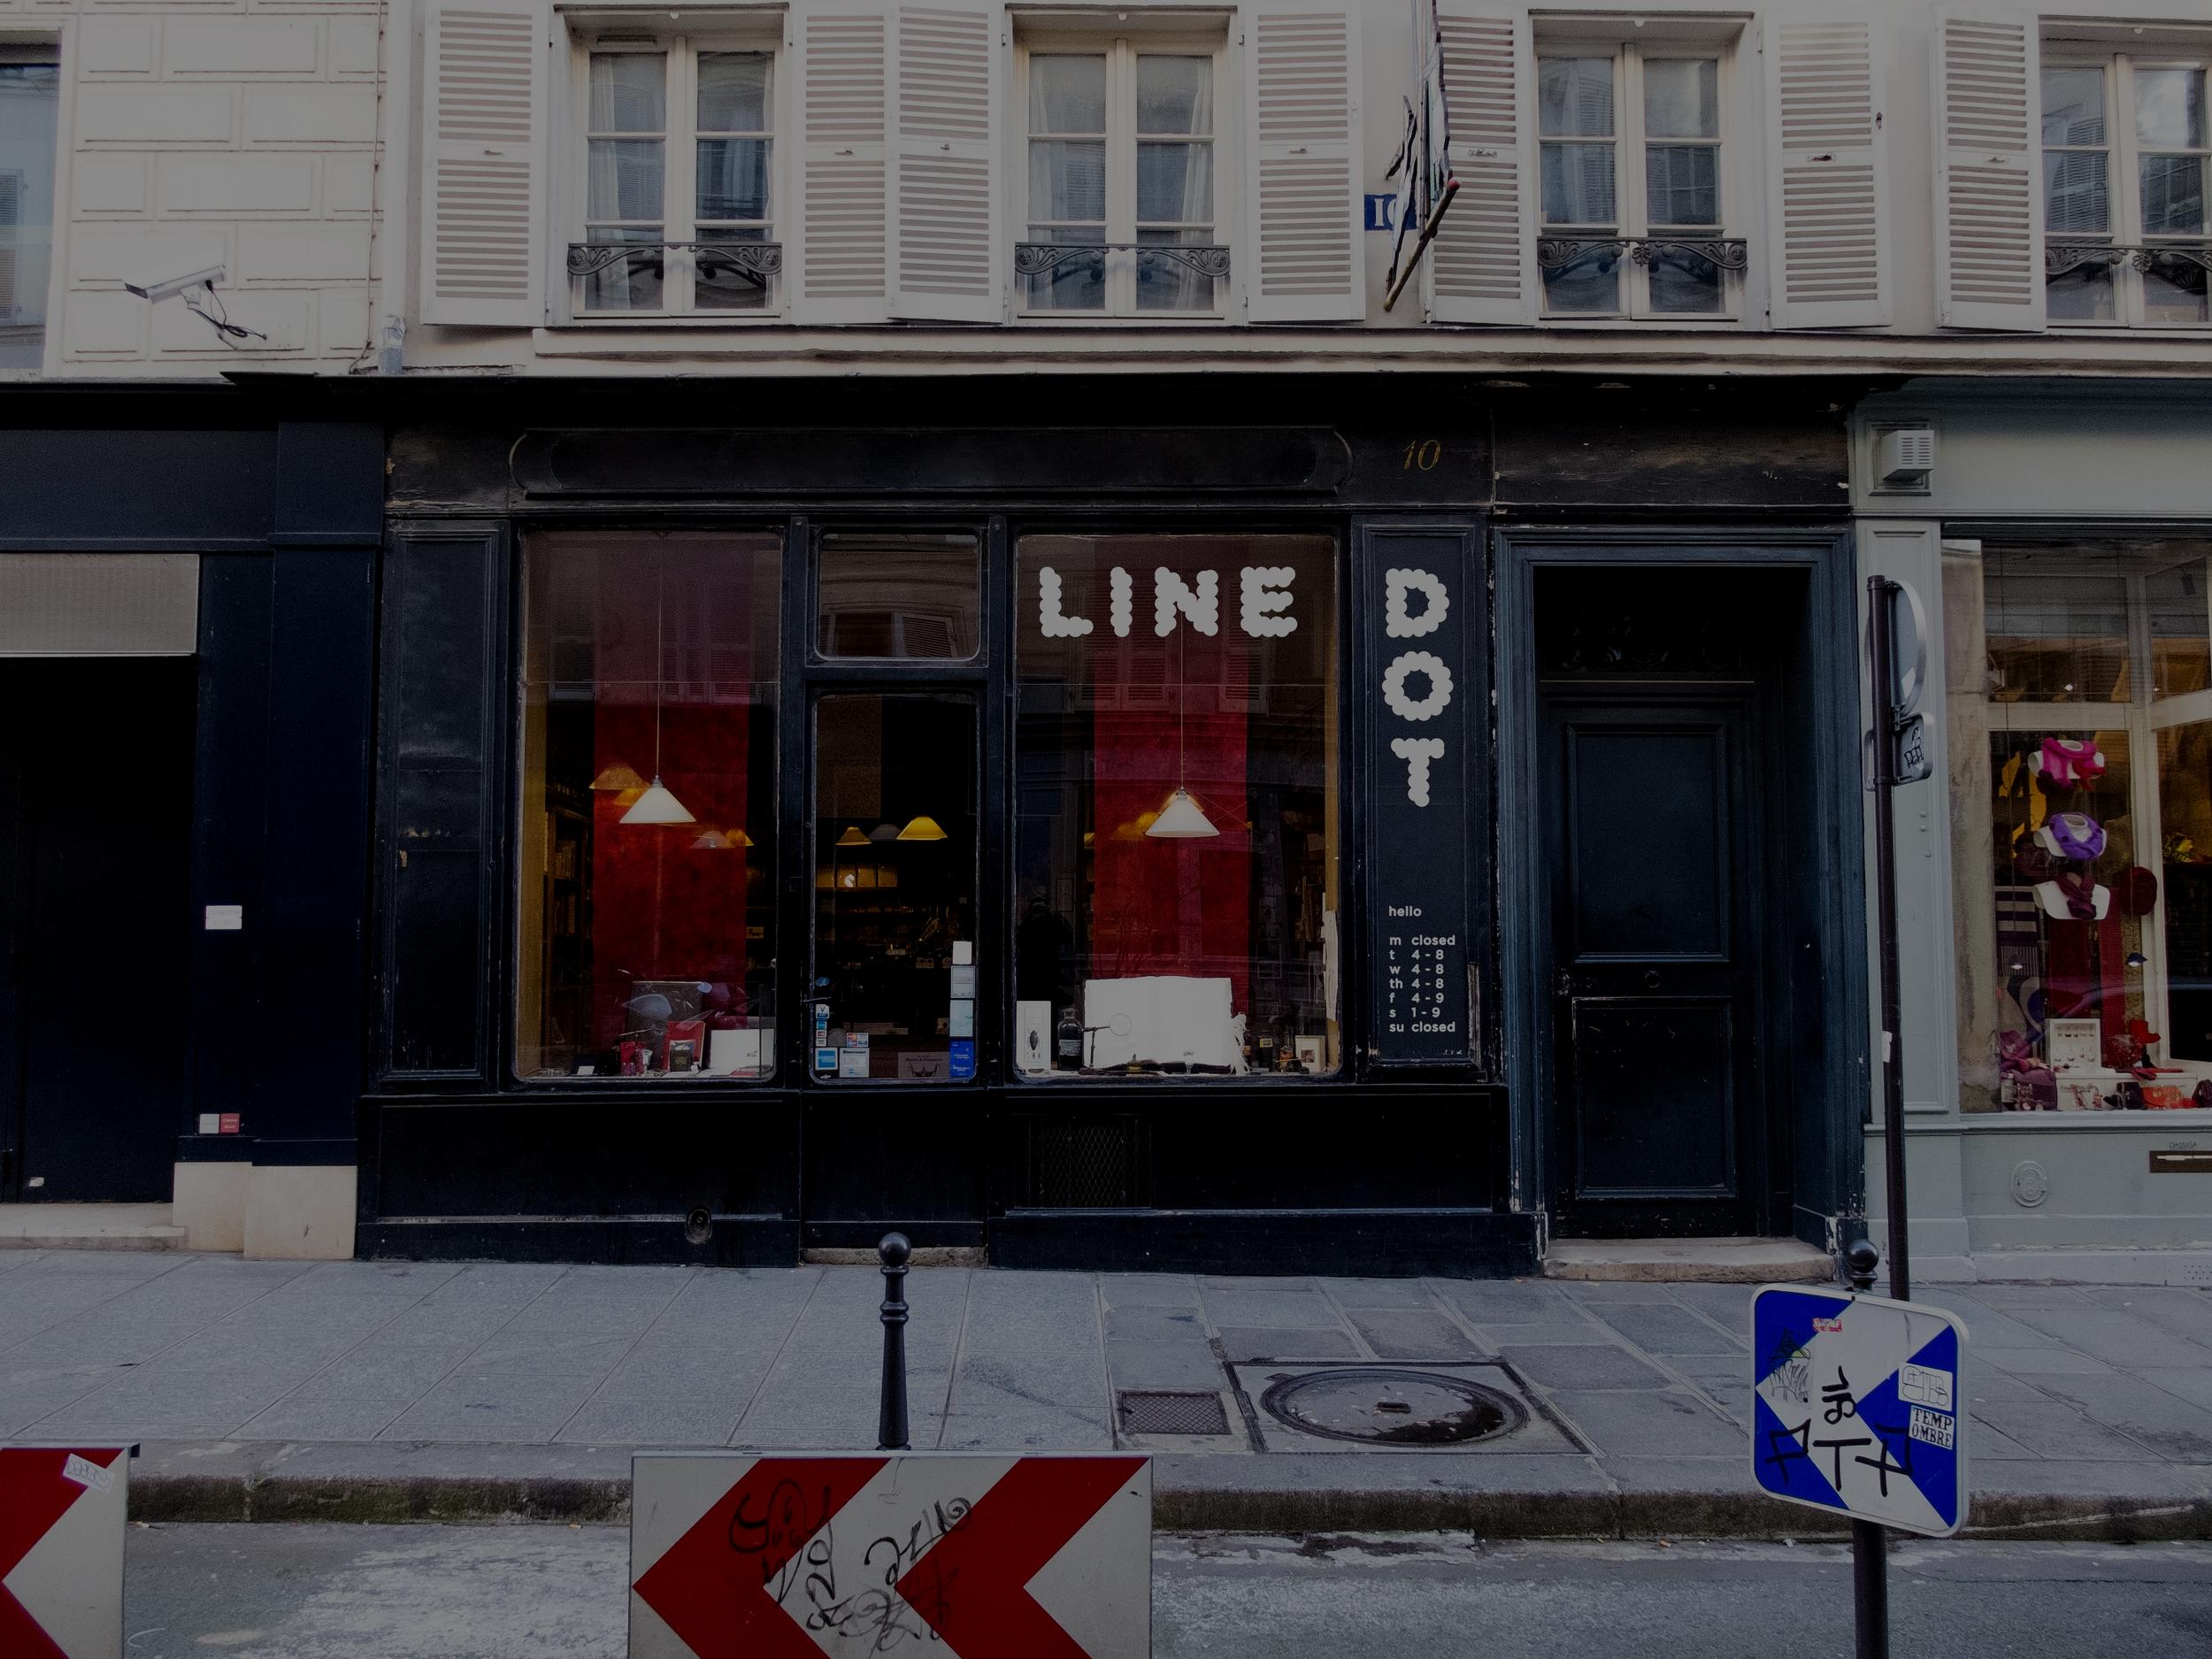 linedot_facade_02_150727.png